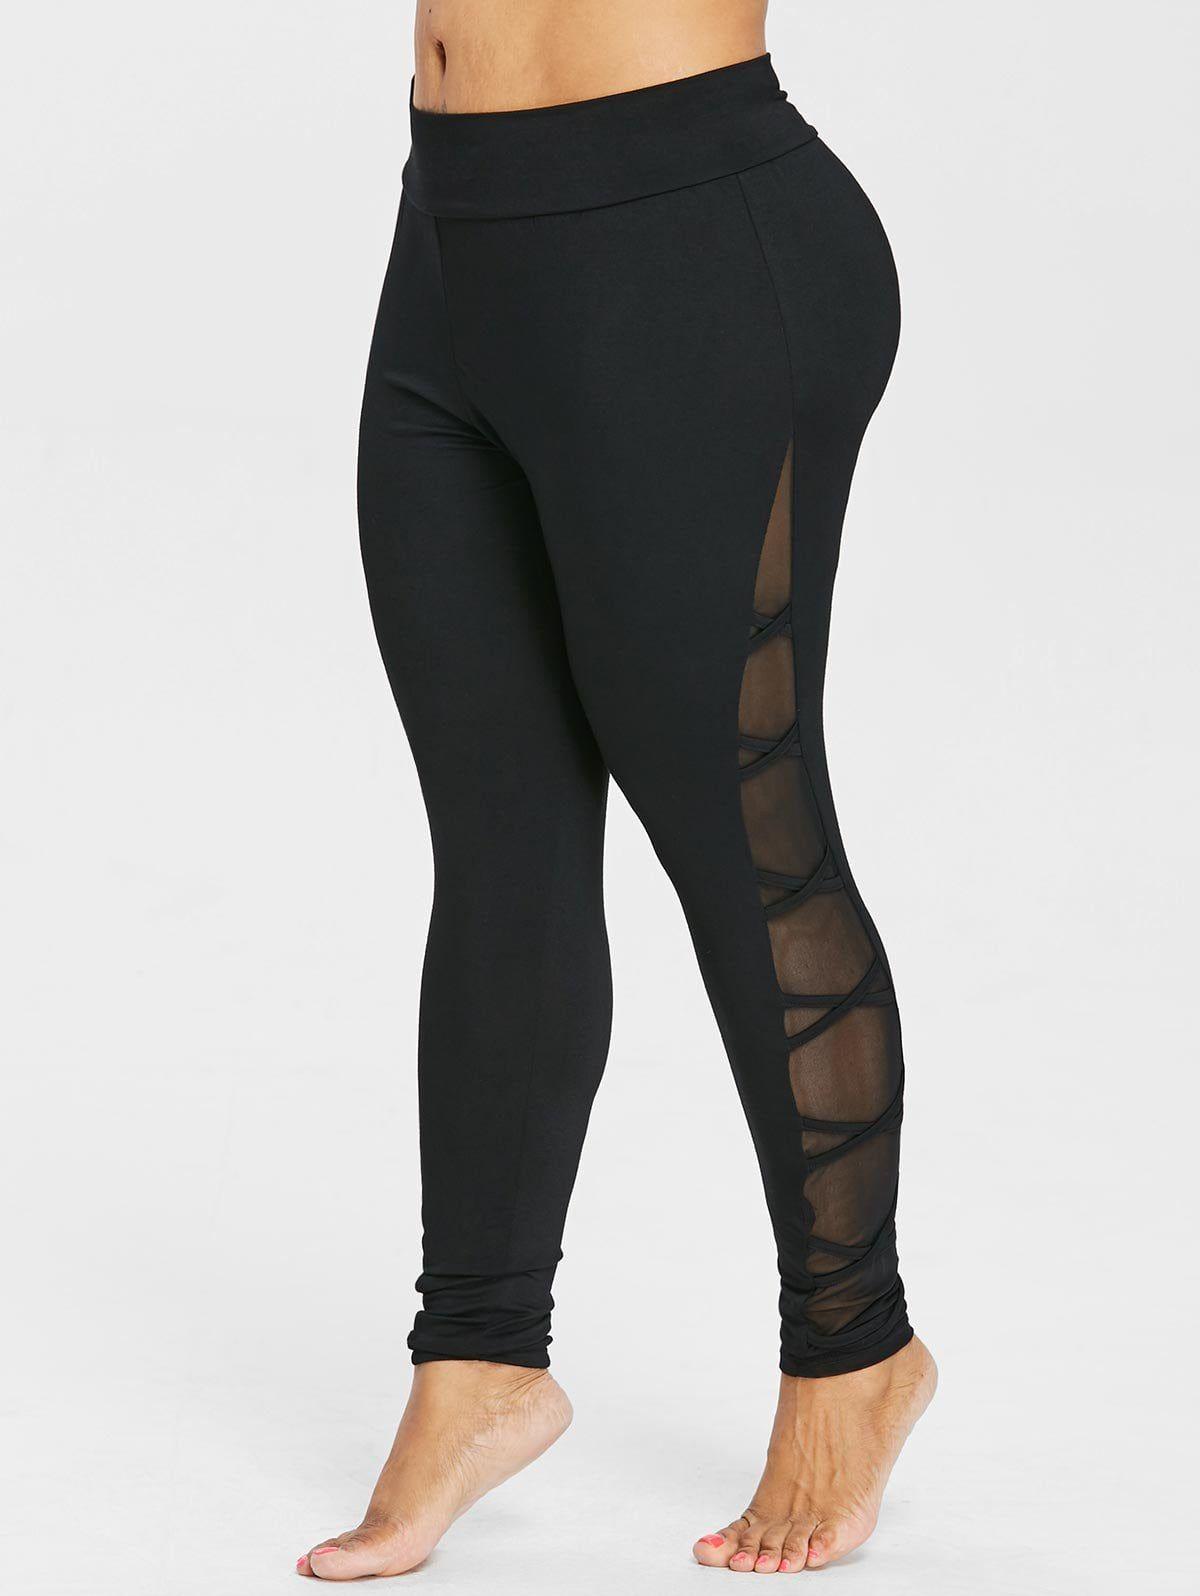 Plus Size Criss Cross Sheer Side Leggings Wide Waistband